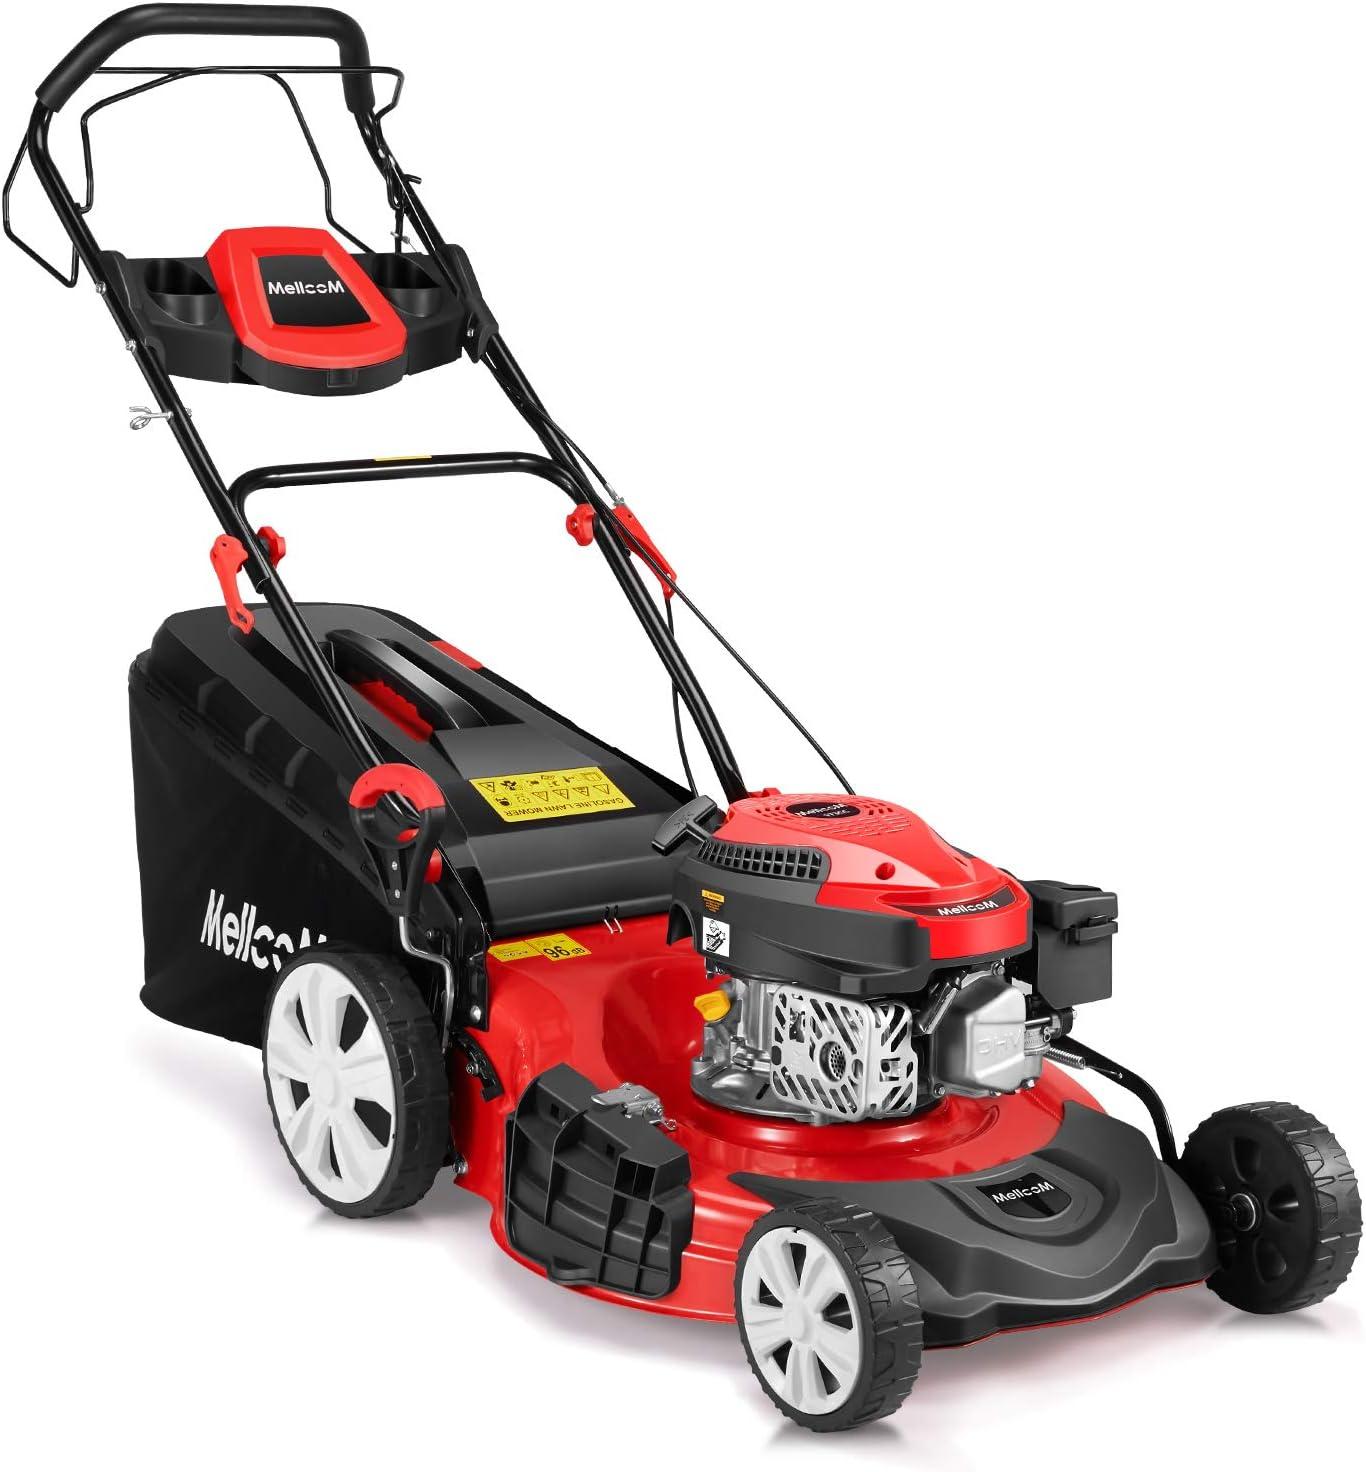 Mellcom Gas Lawn Mower 4-Cycle 173cc OHV 21-Inch Trimming Mower